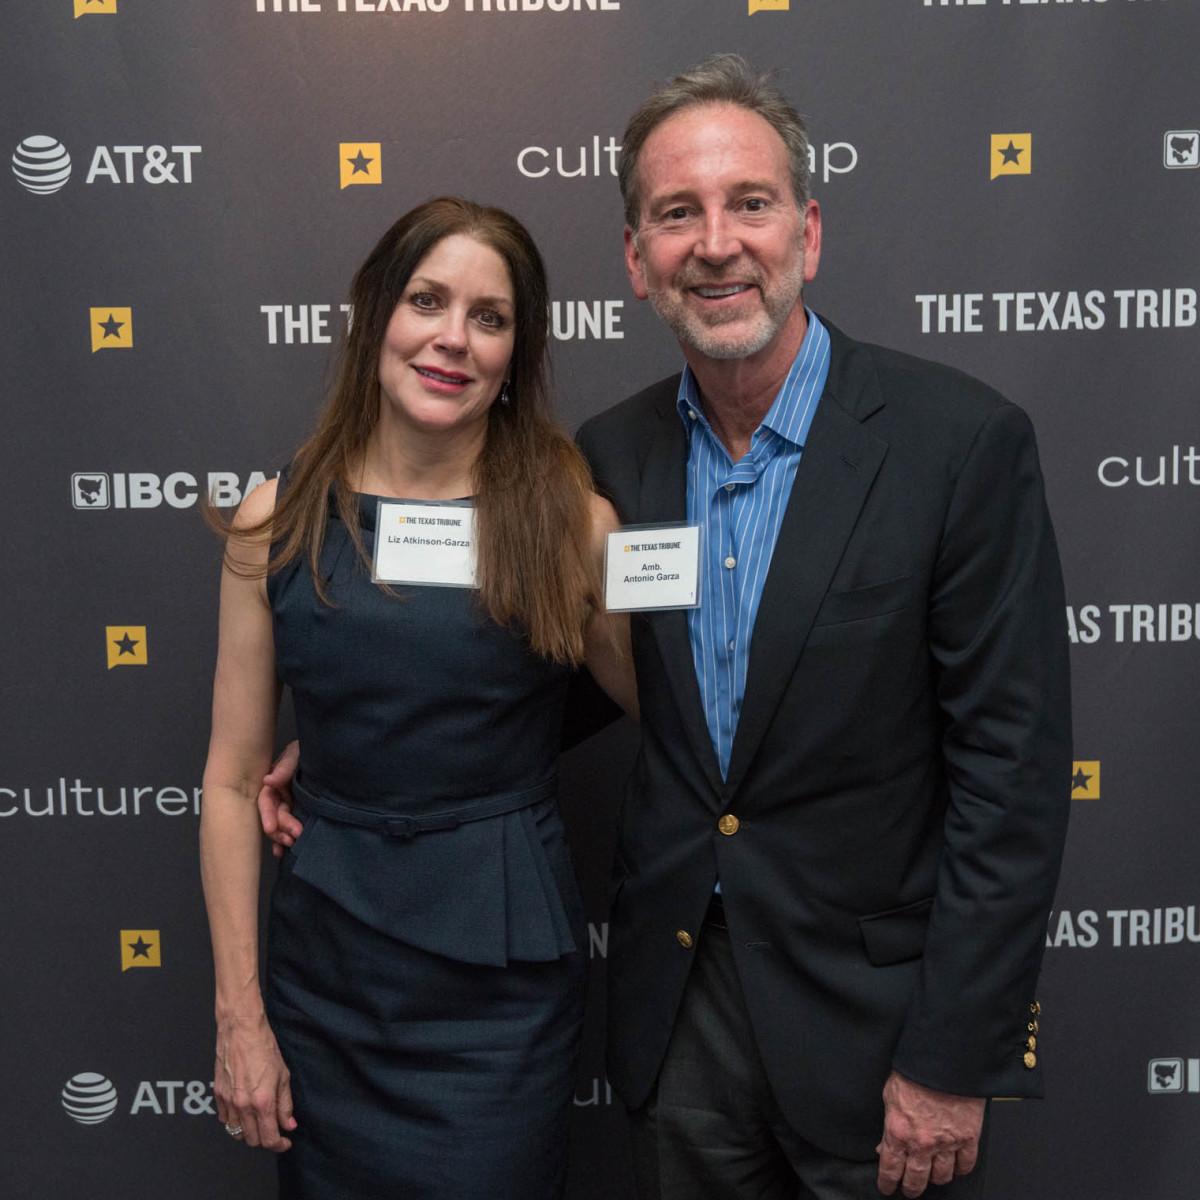 Texas Tribune Festival 2018 VIP Cocktail Hour at Brazos Hall Liz Atkinson-Garcia Ambassador Antonio Garza